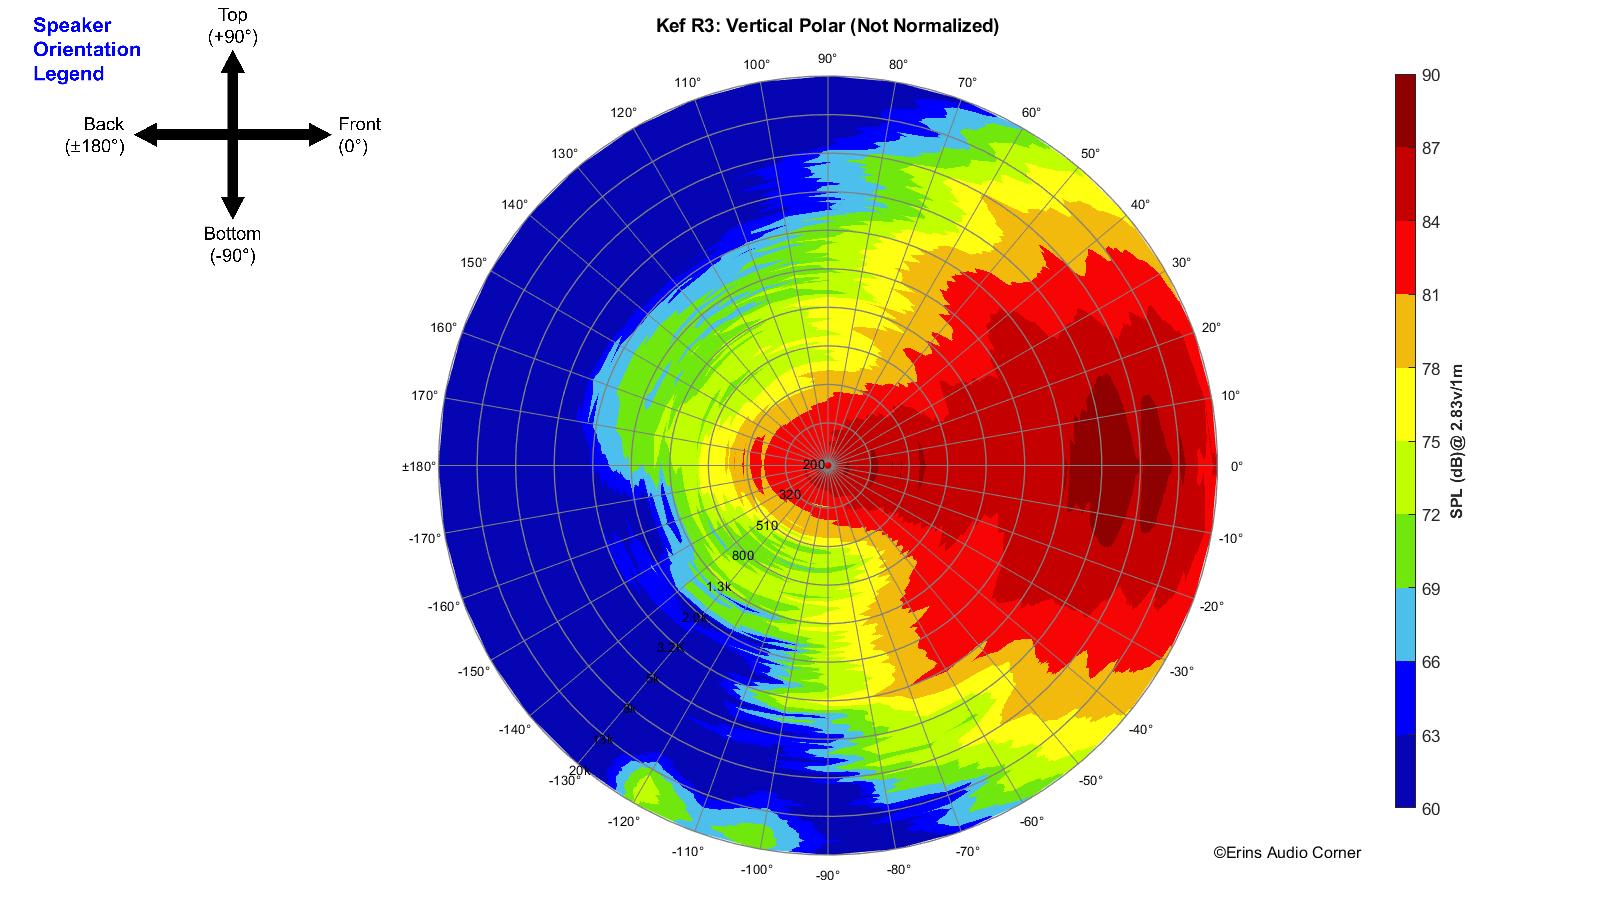 Kef%20R3_360_Vertical_Polar.png